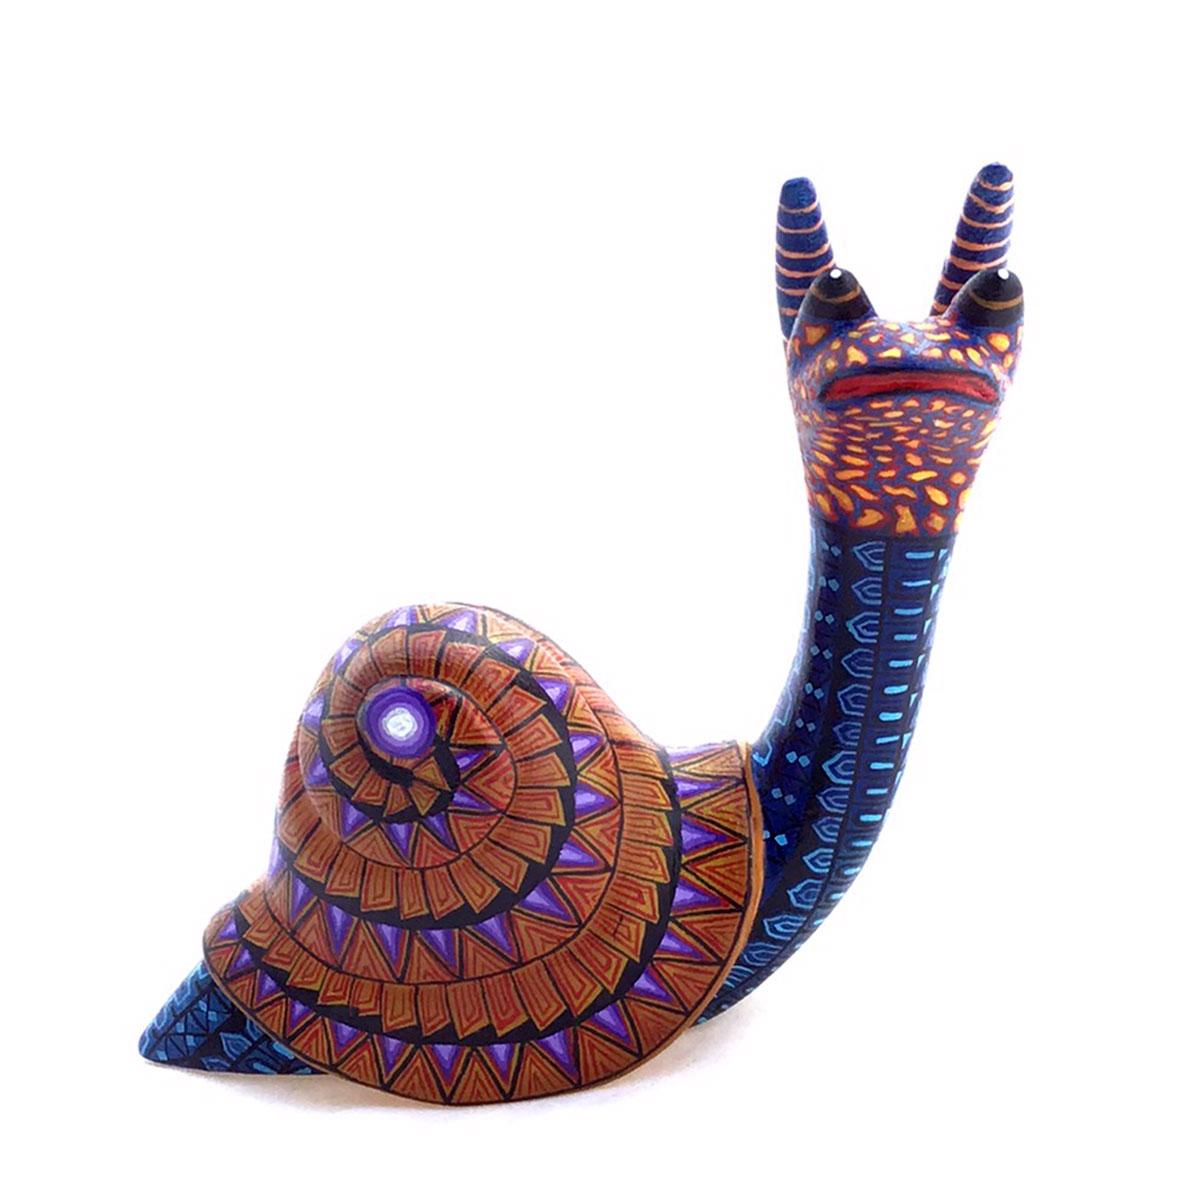 Esmeralda Cruz Sosa Esmeralda Cruz Sosa: Snail shelled gastropod